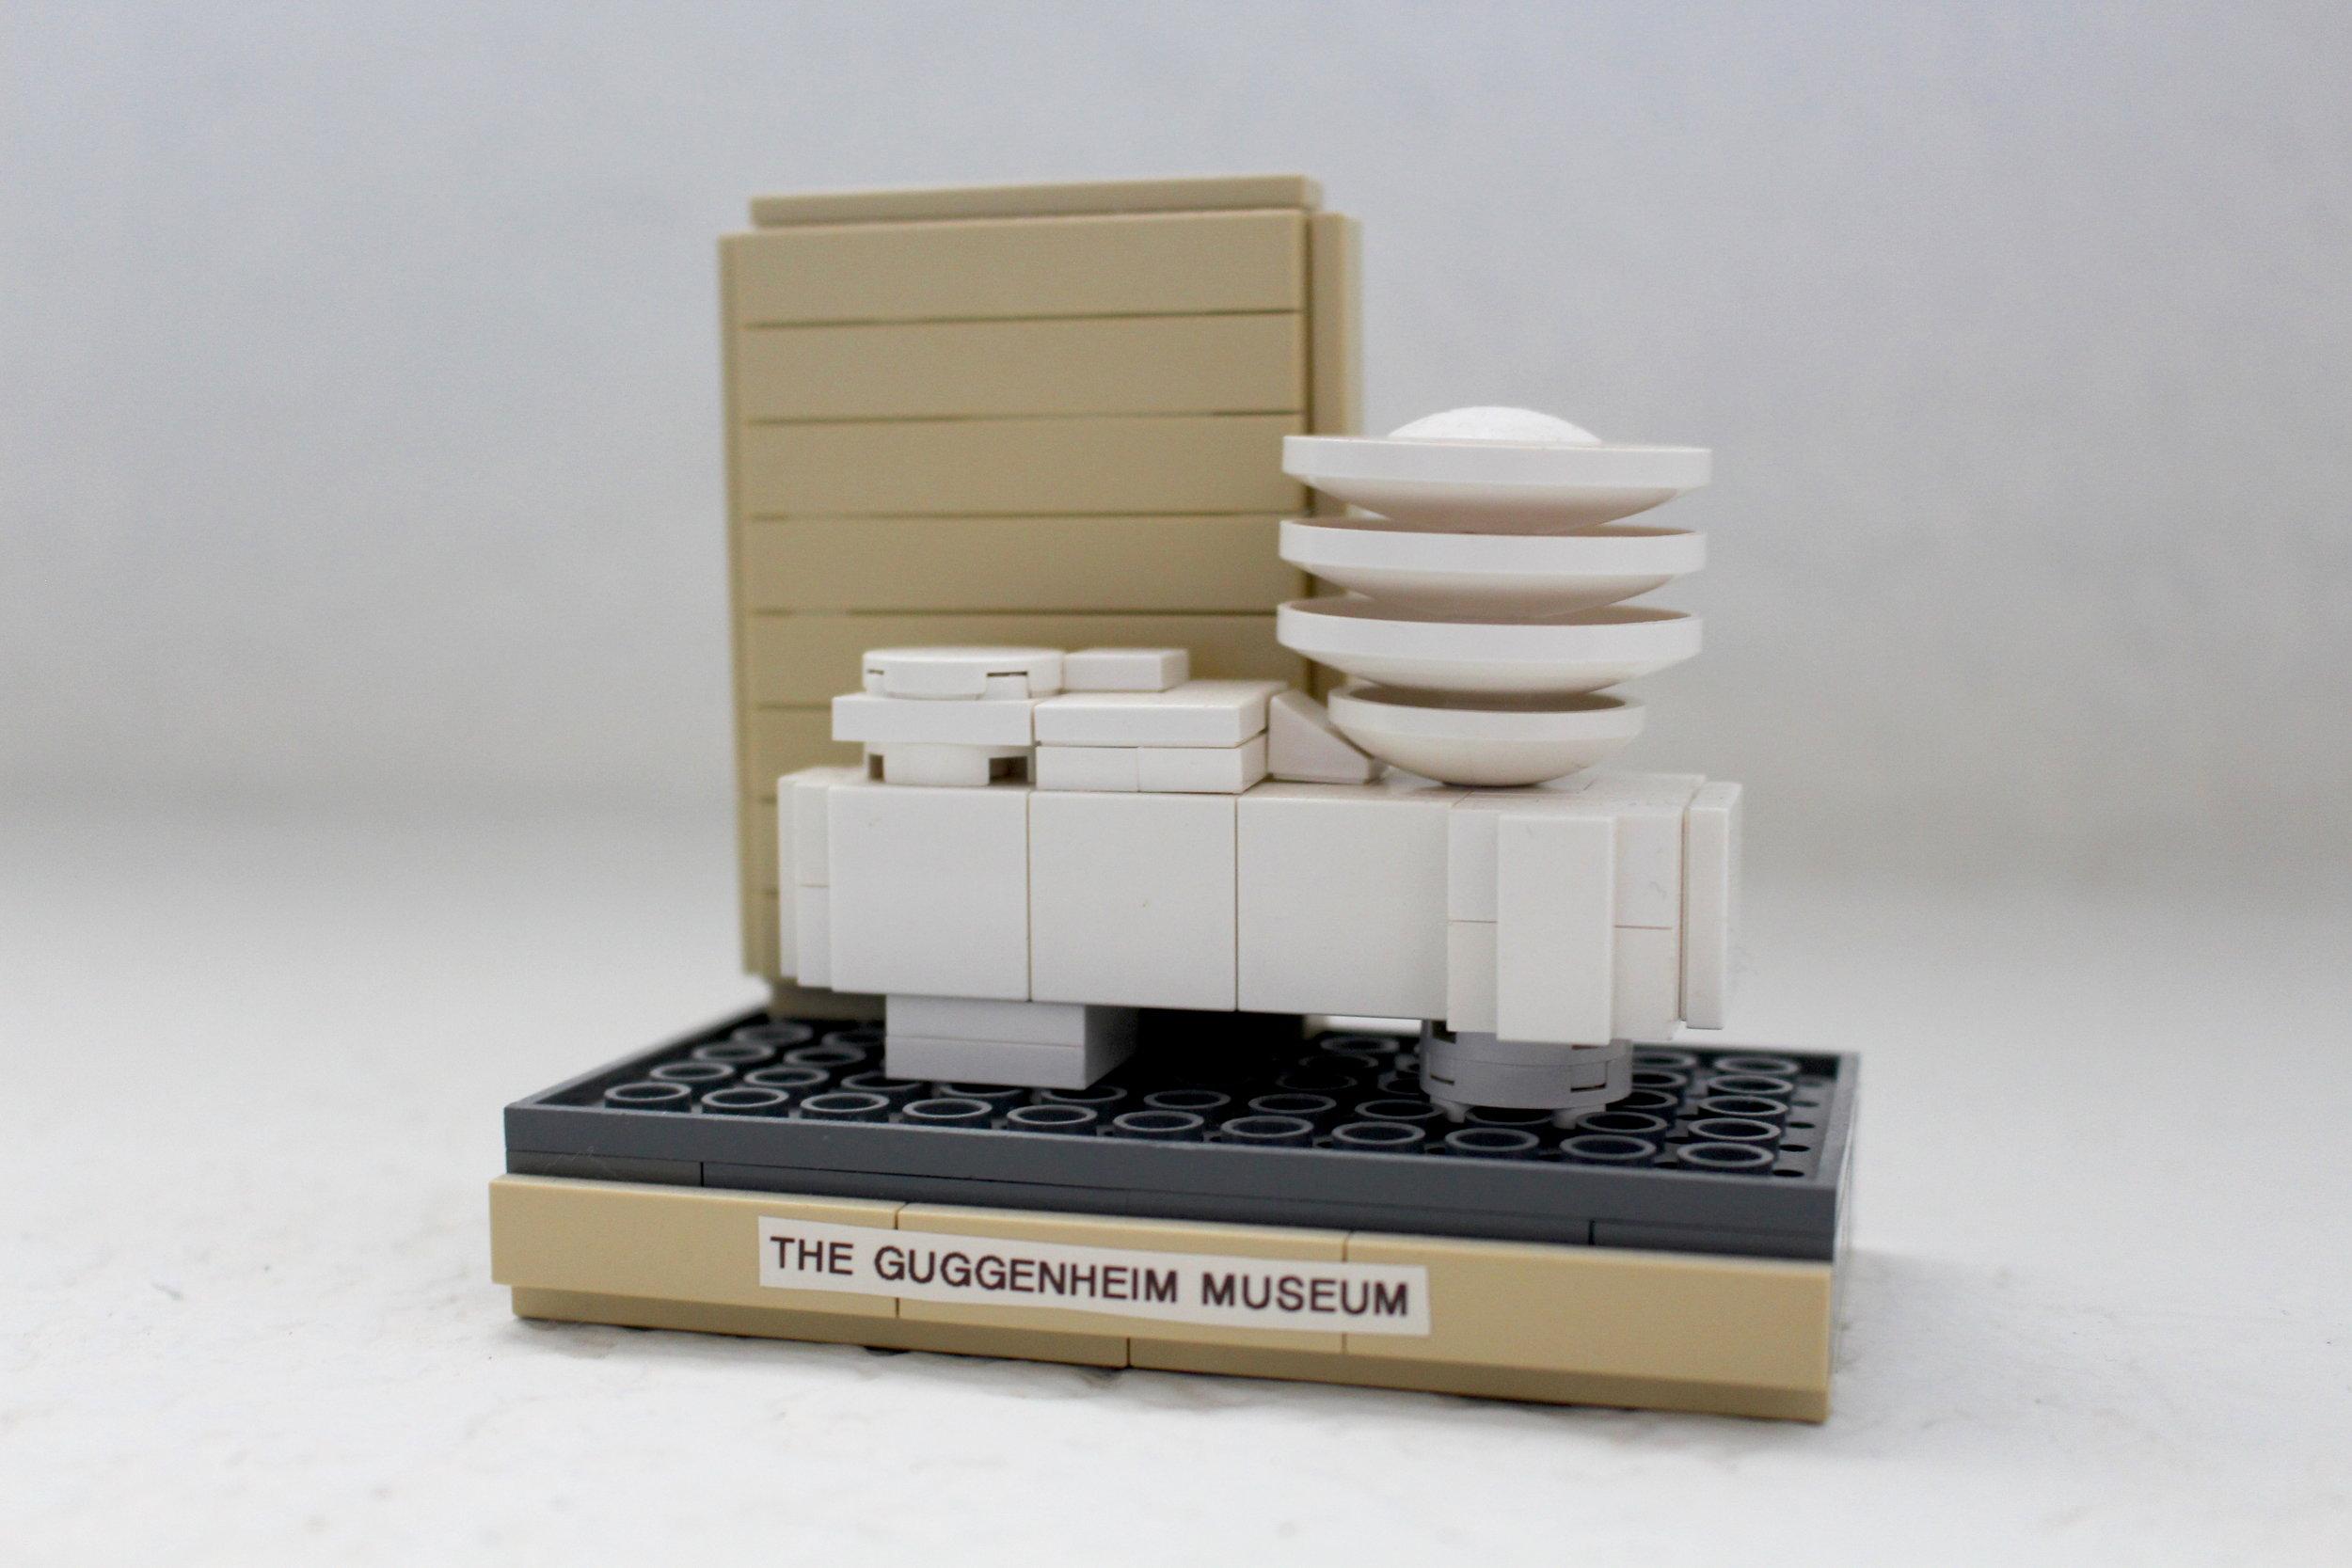 Guggenheim 1.JPG